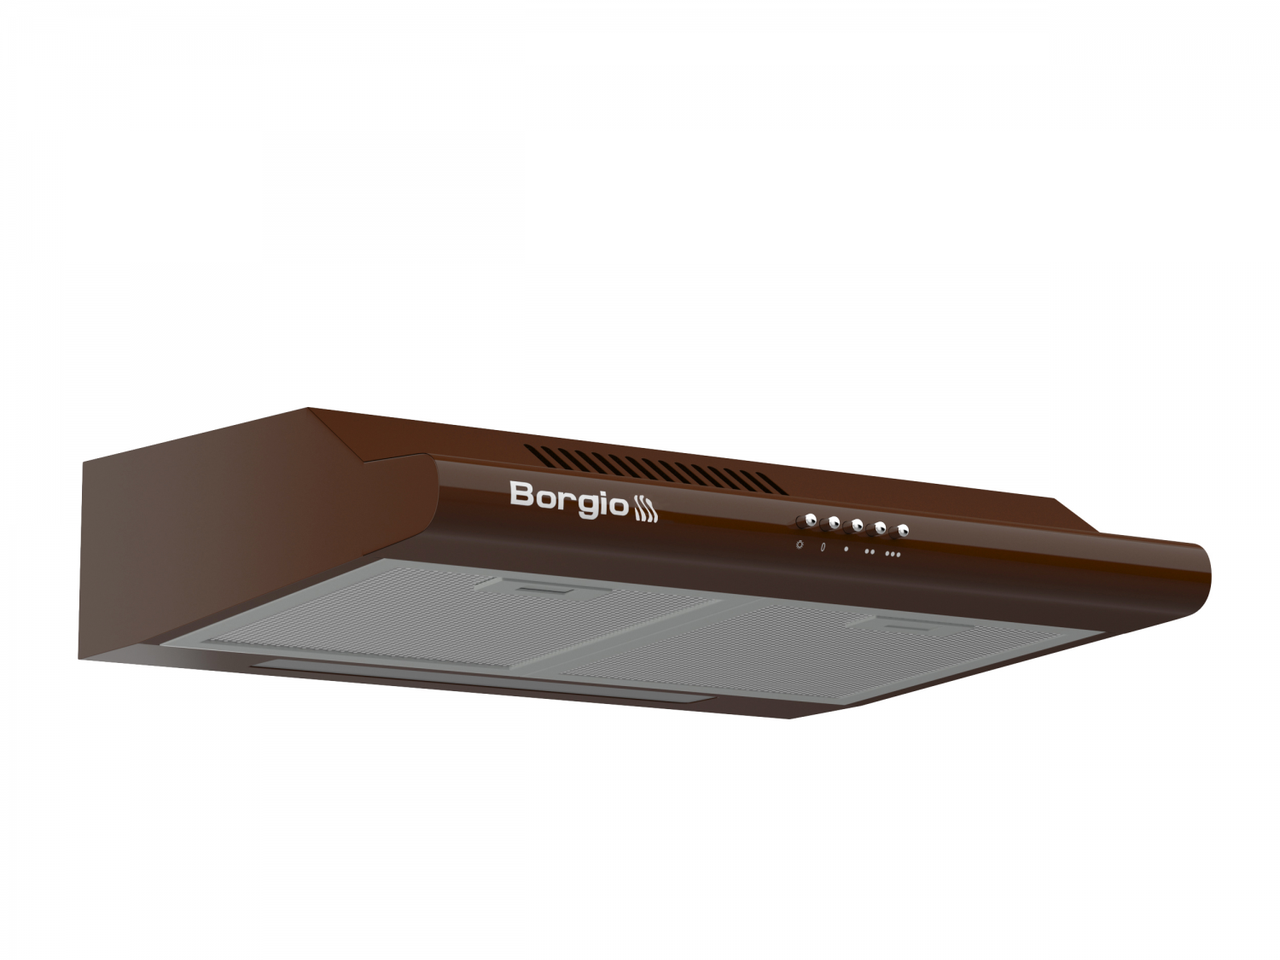 Кухонна витяжка плоска коричнева BORGIO Gio 60 brown